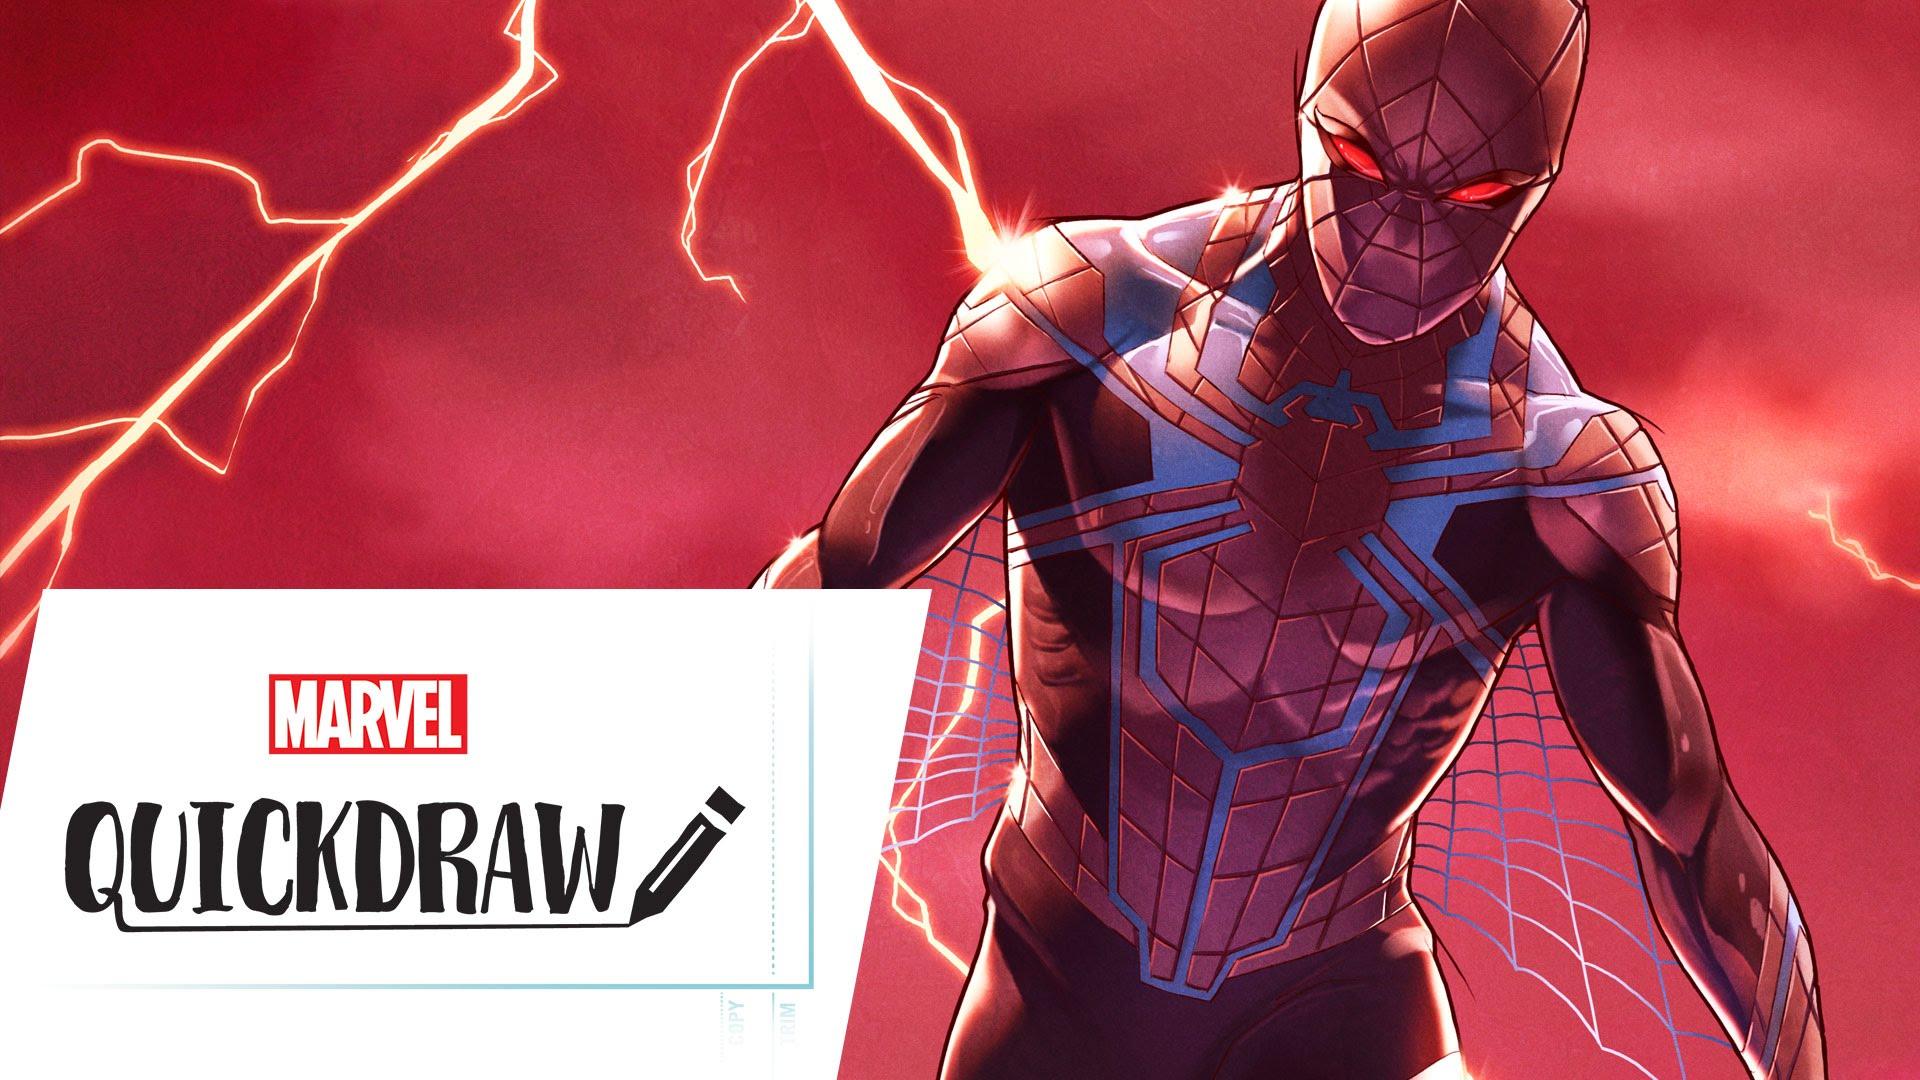 Marvel Quickdraw Season 1 8